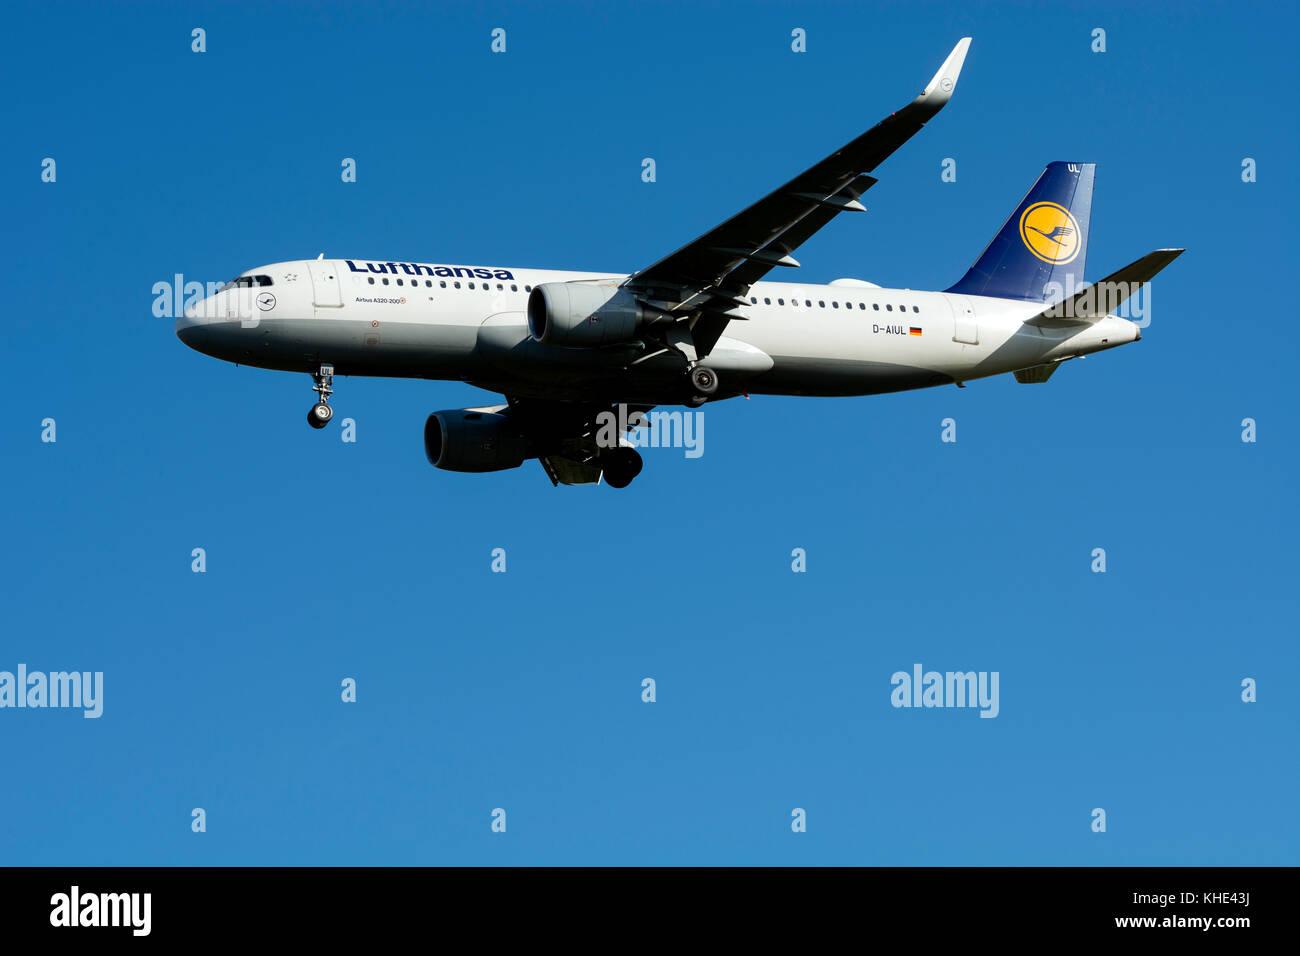 Lufthansa Airbus A320-200 landing at Birmingham Airport, UK (D-AIUL) - Stock Image